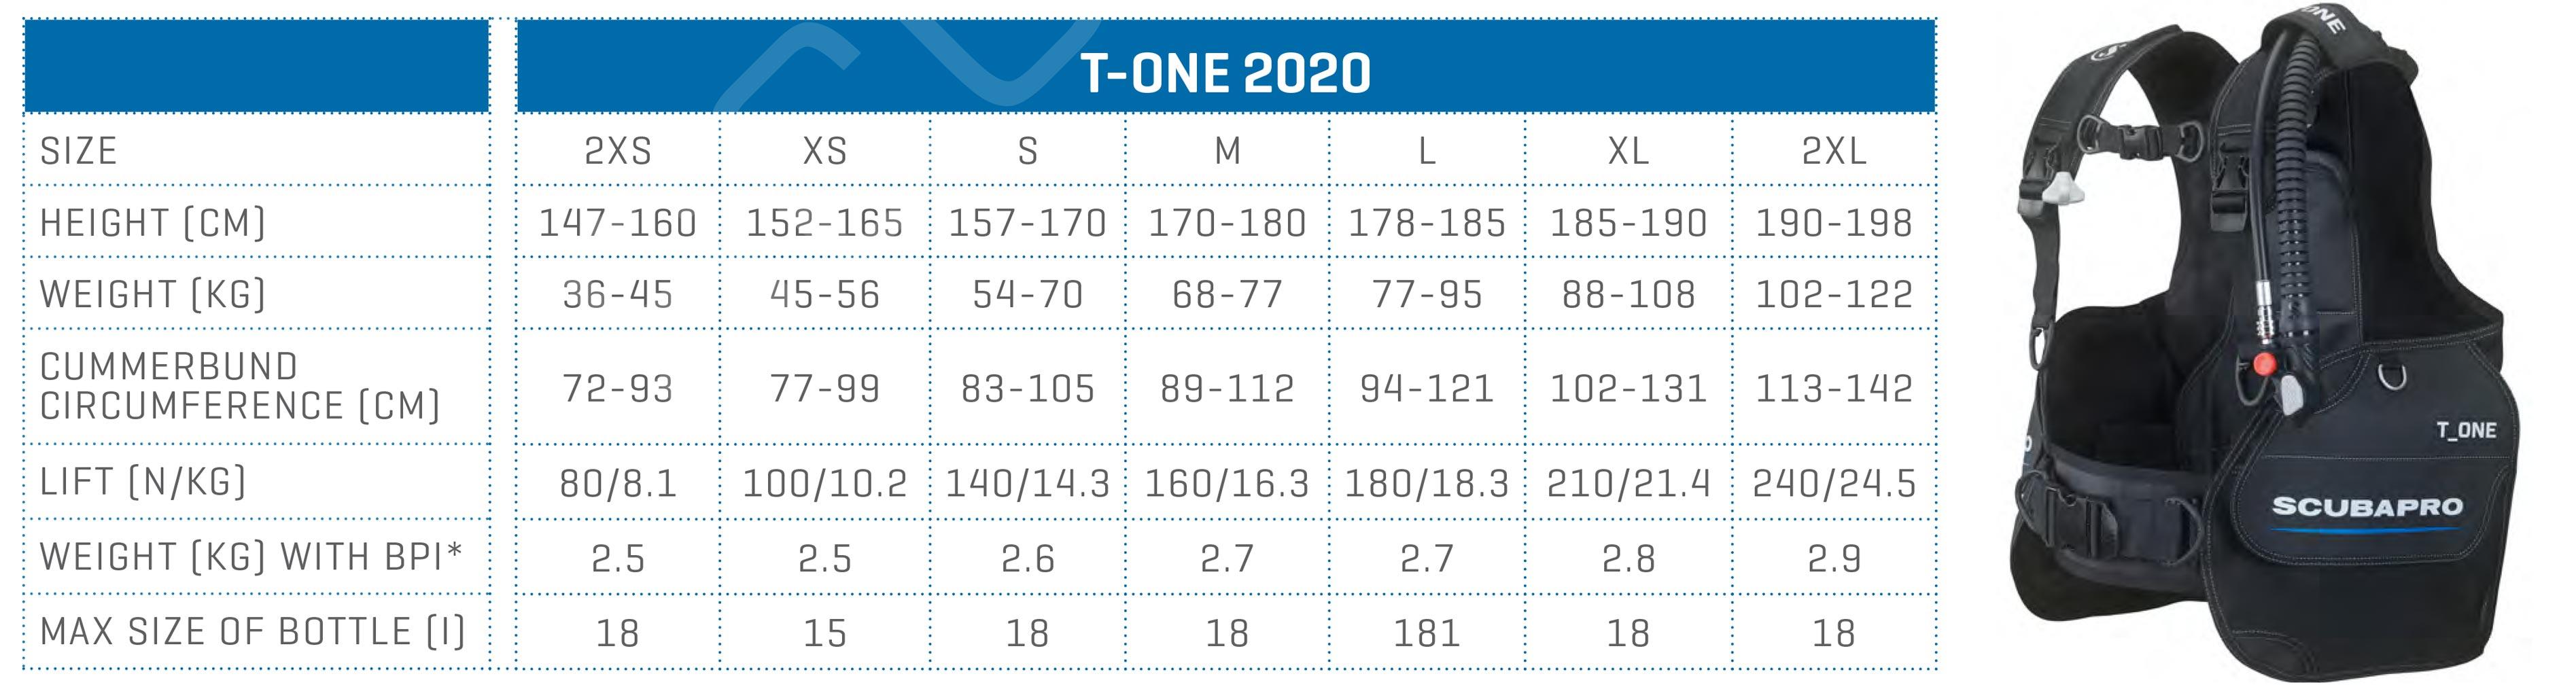 SCUBAPRO size chart BCD T-ONE